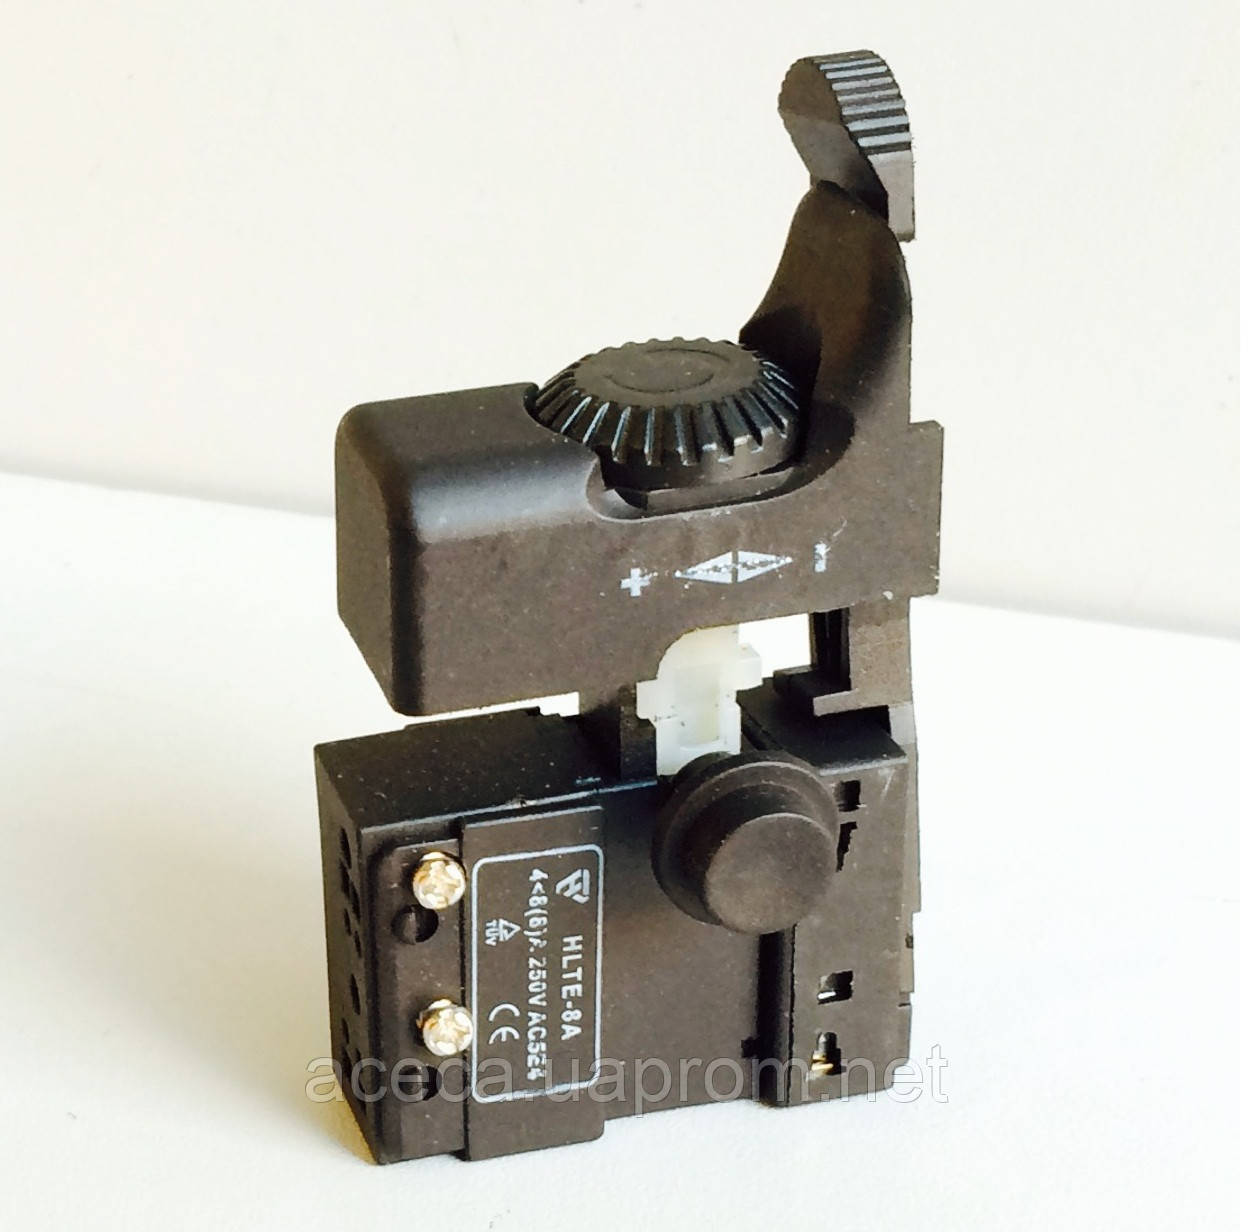 Кнопка дрели Интерскол 350 - 800 w